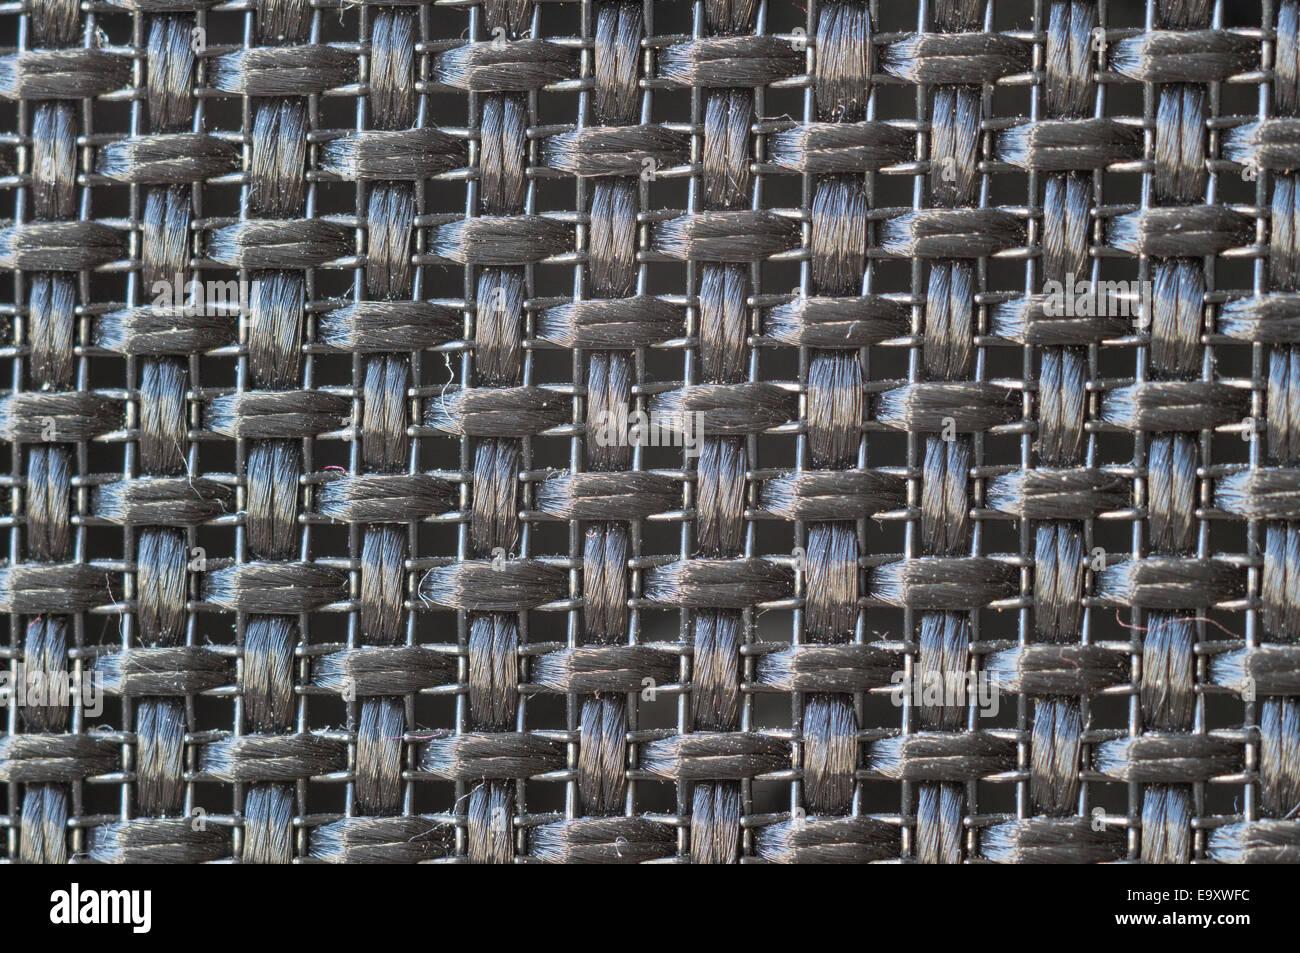 Mesh, mesh, mesh - Stock Image